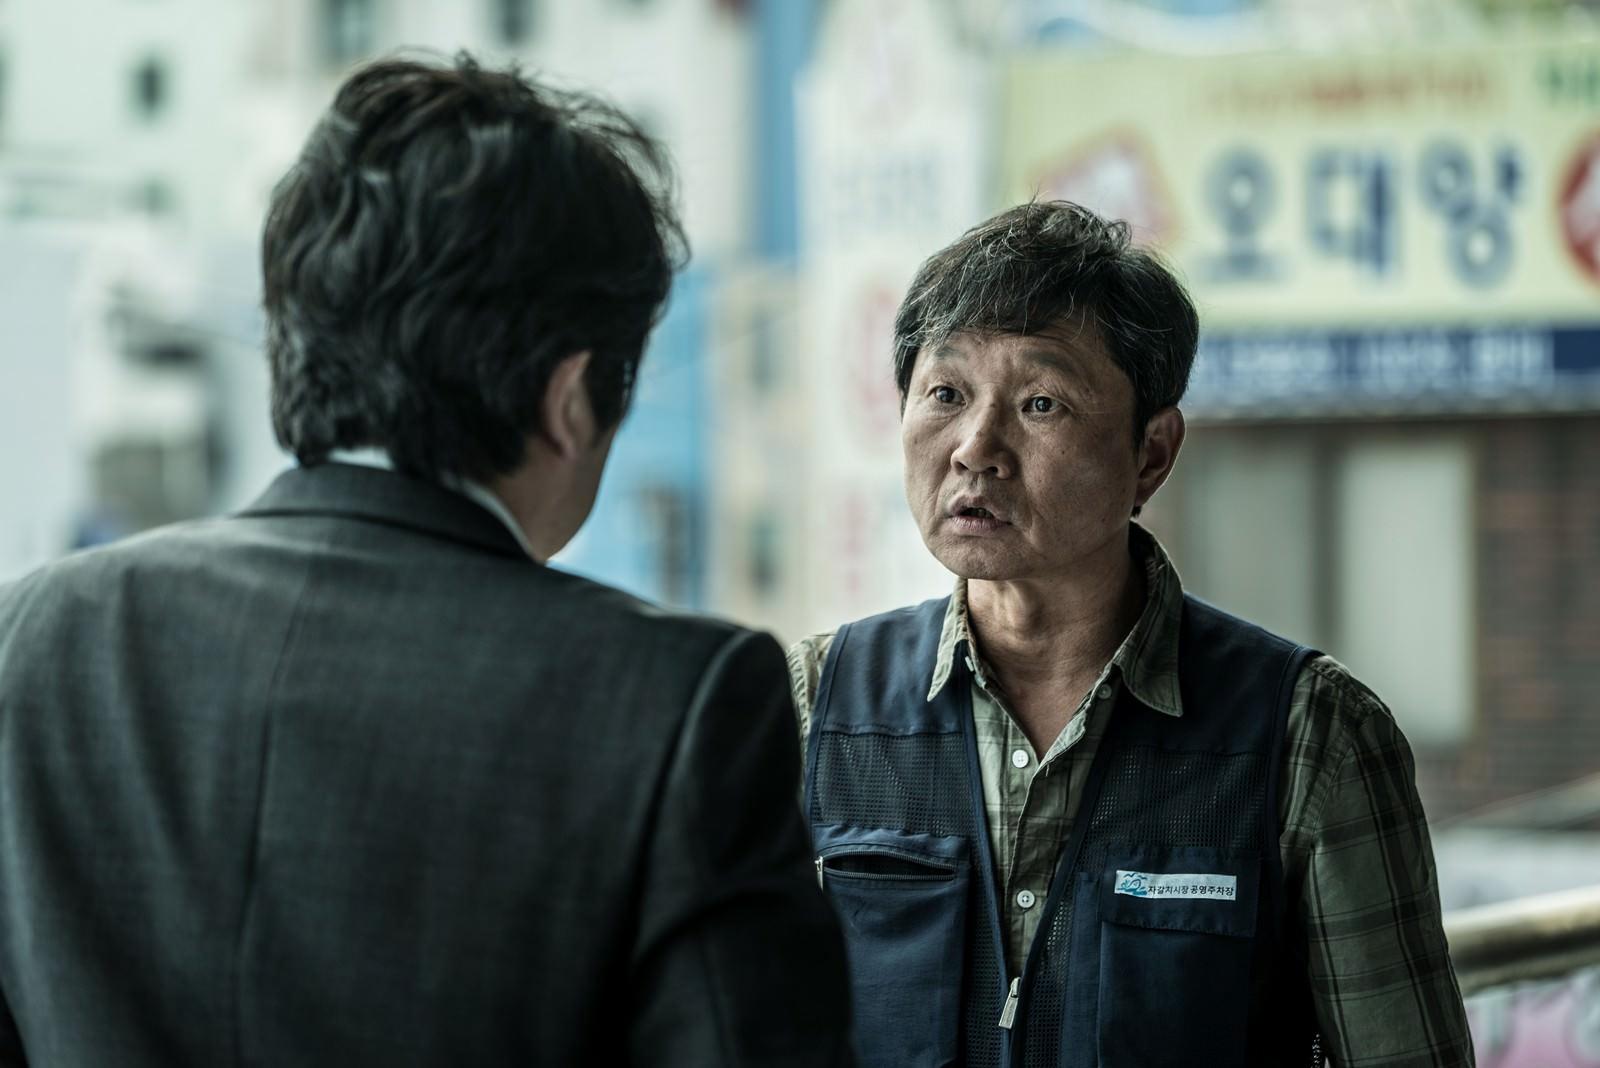 Movie, 암수살인(韓國, 2018年) / 七罪追緝令(台灣) / Dark Figure of Crime(英文) / 暗数杀人(口語), 電影劇照, 角色與演員介紹